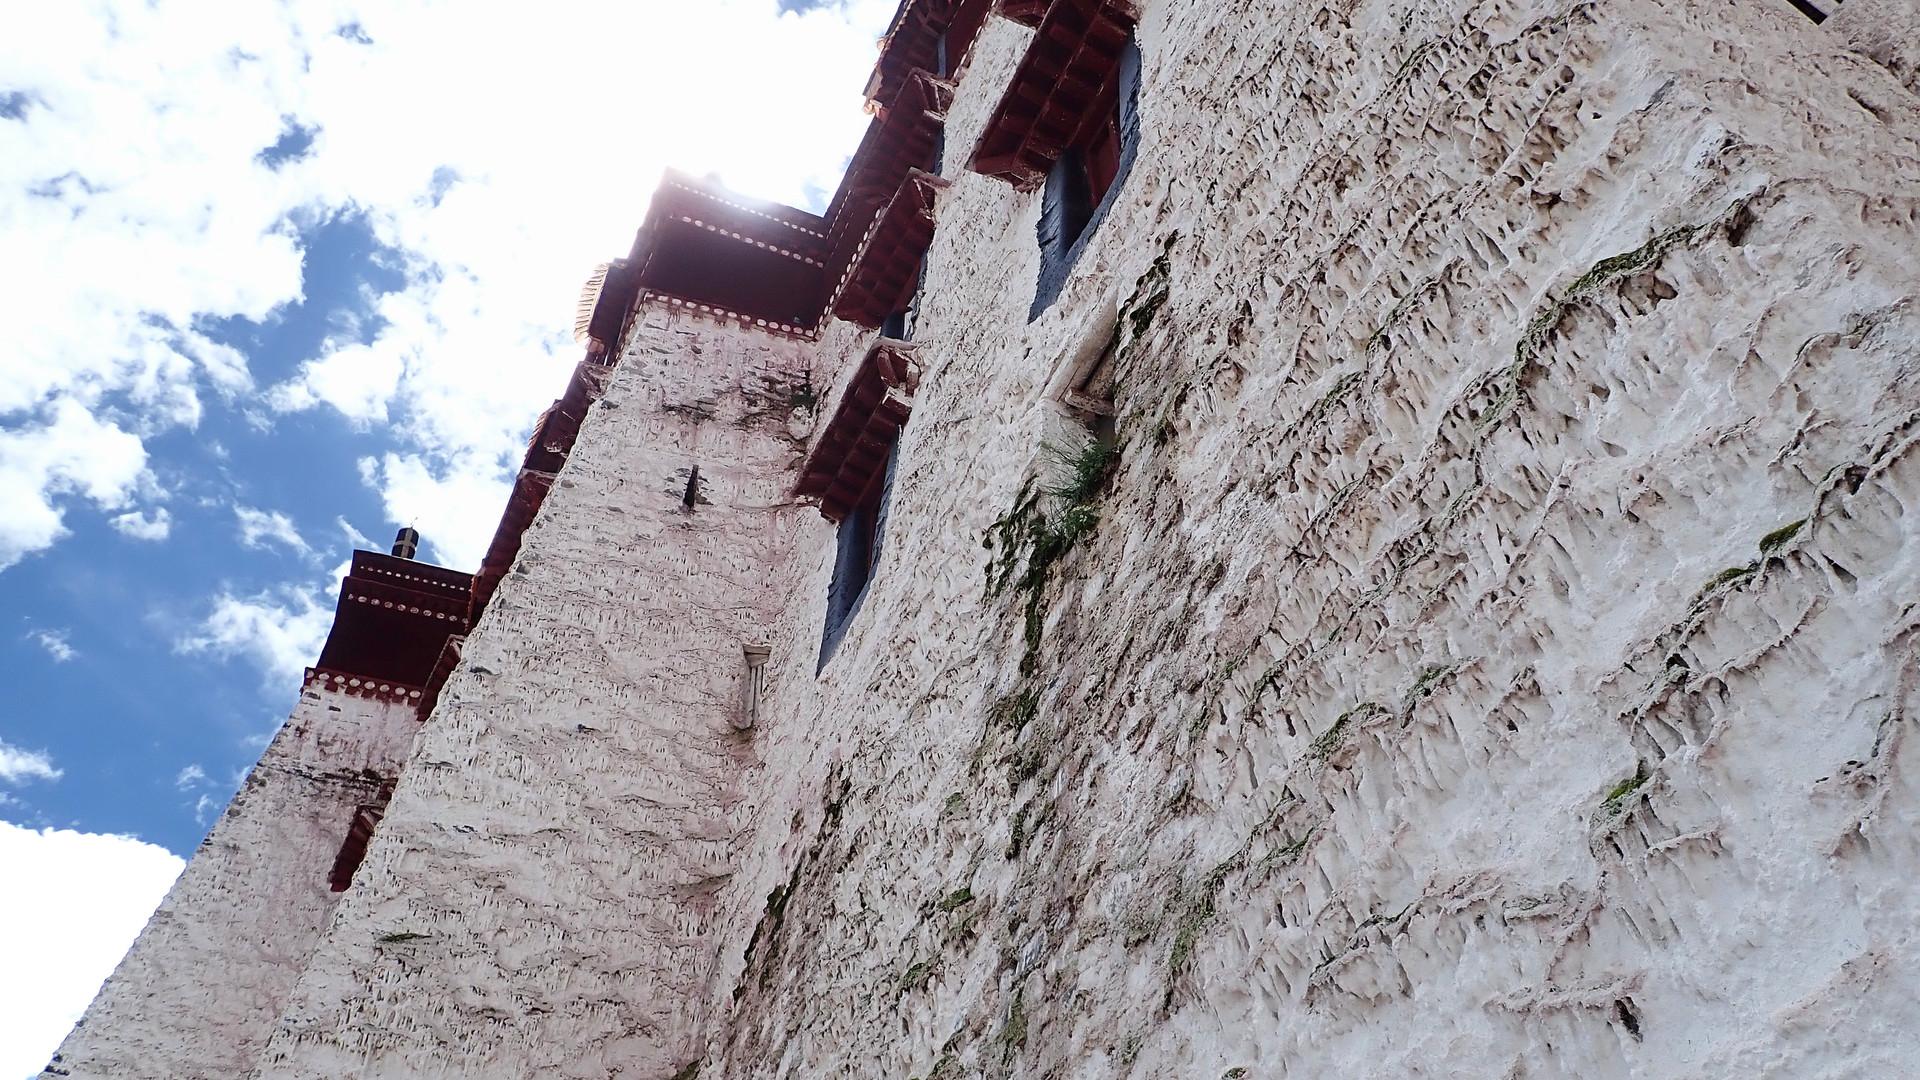 Architectural Majesty